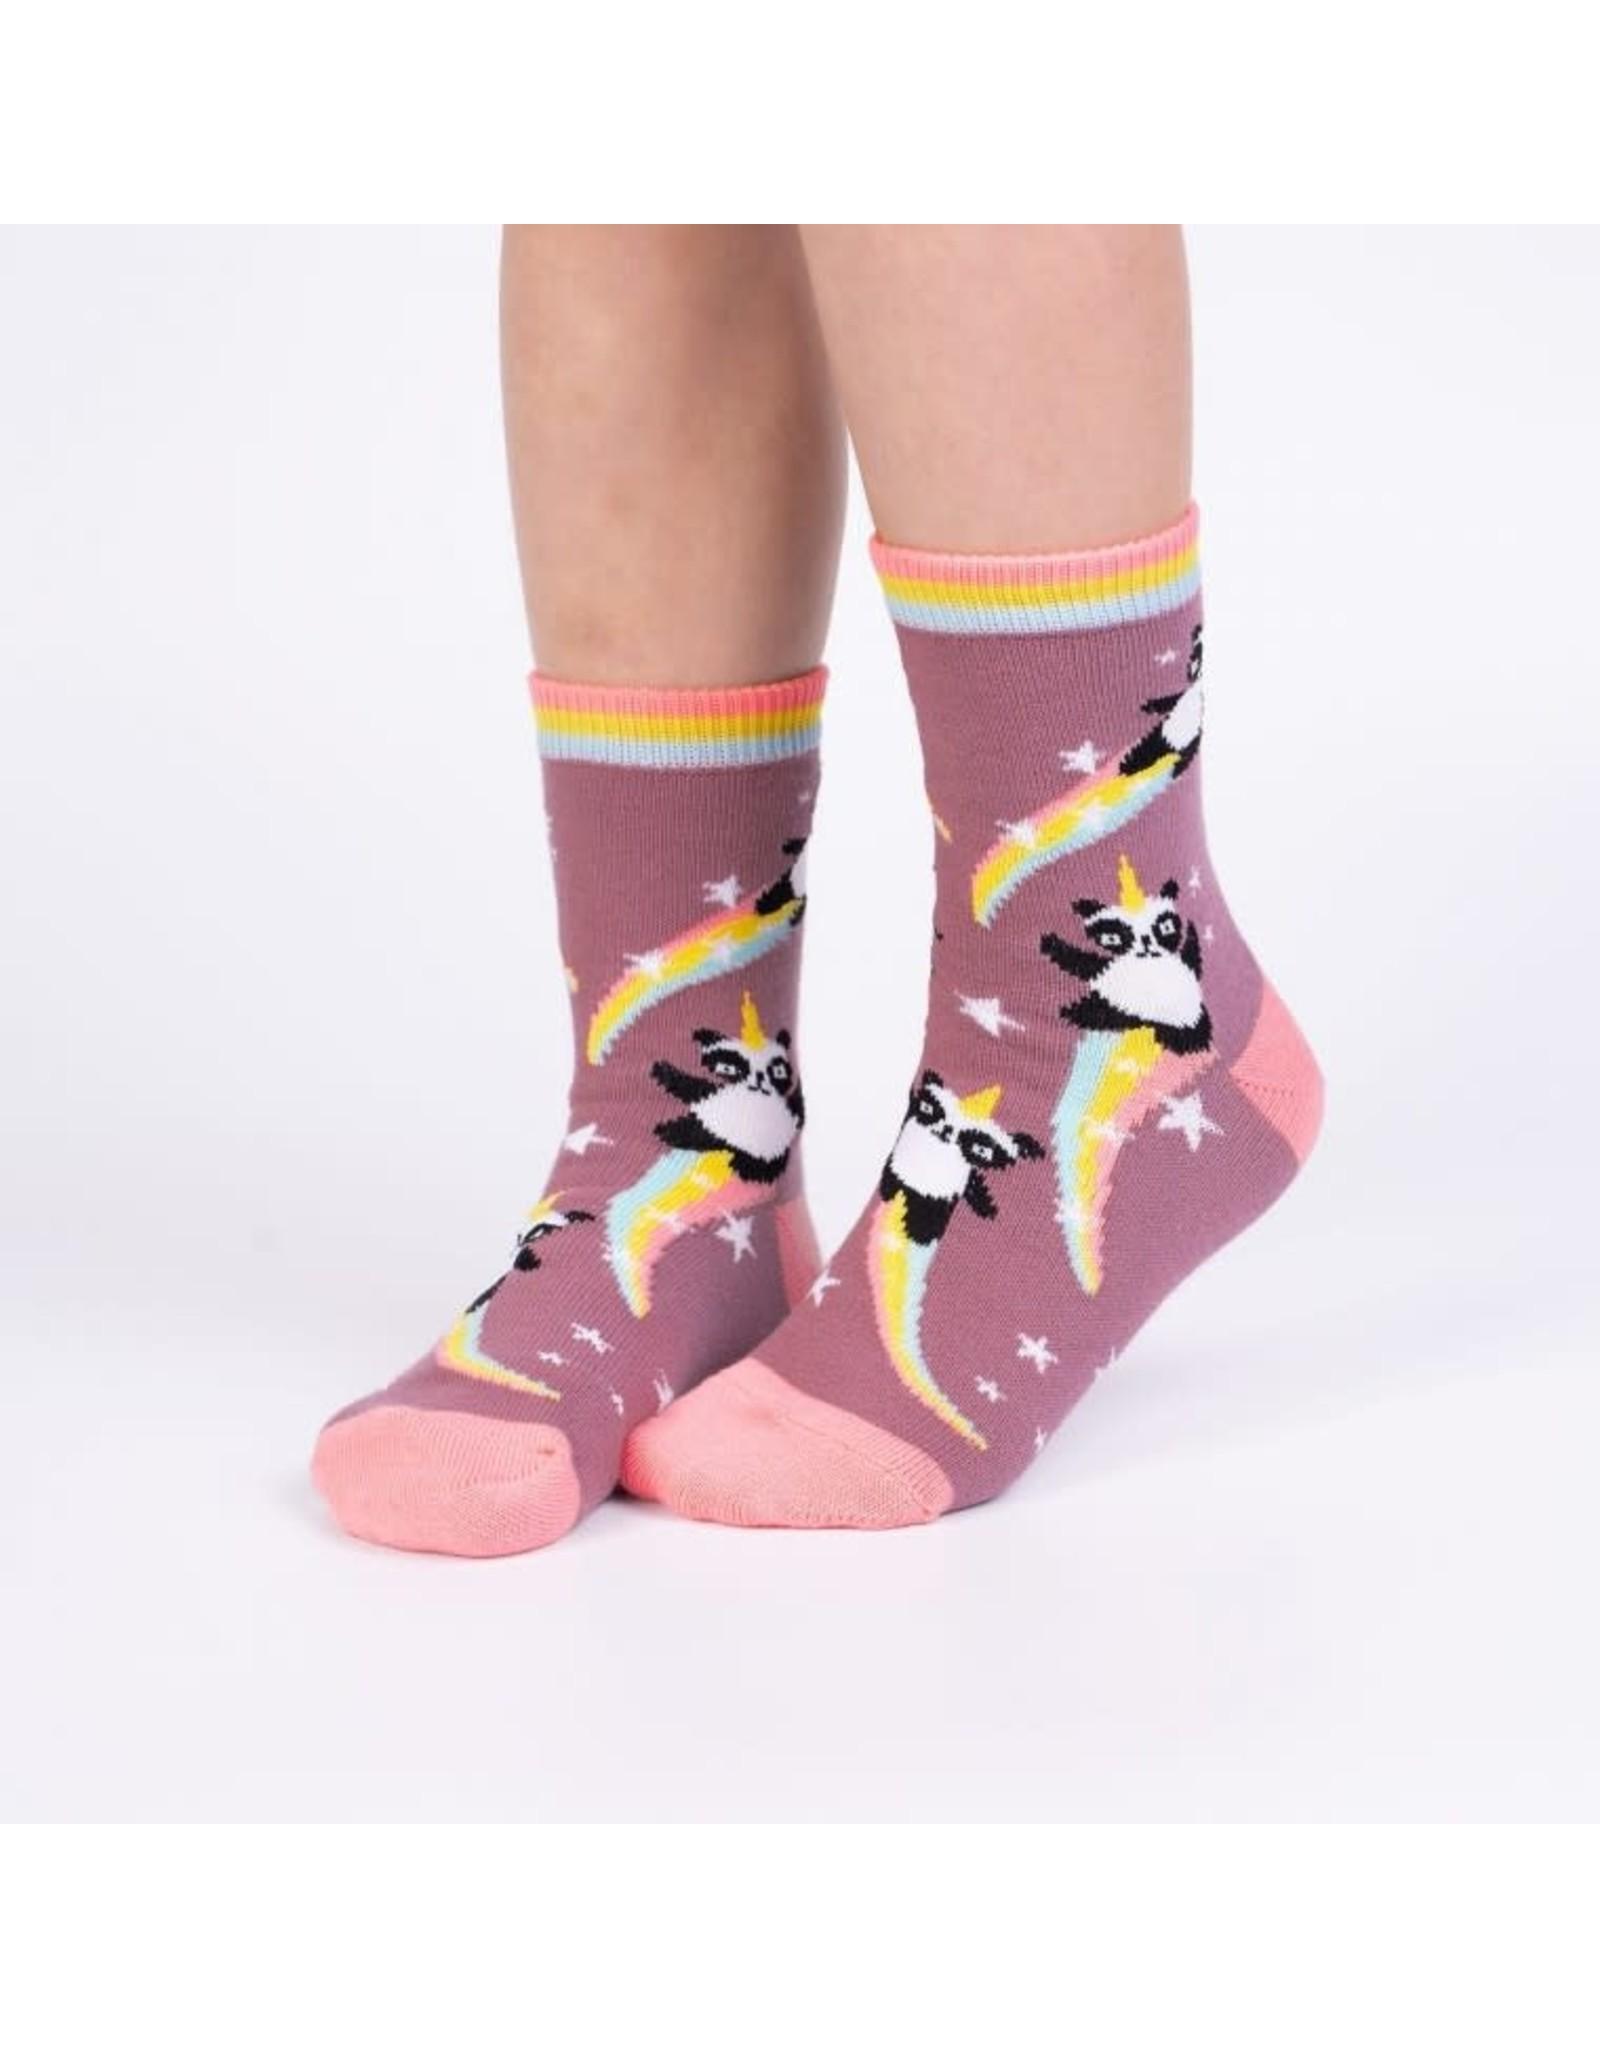 SOCK IT TO ME - Junior Pandacorn Crew Socks